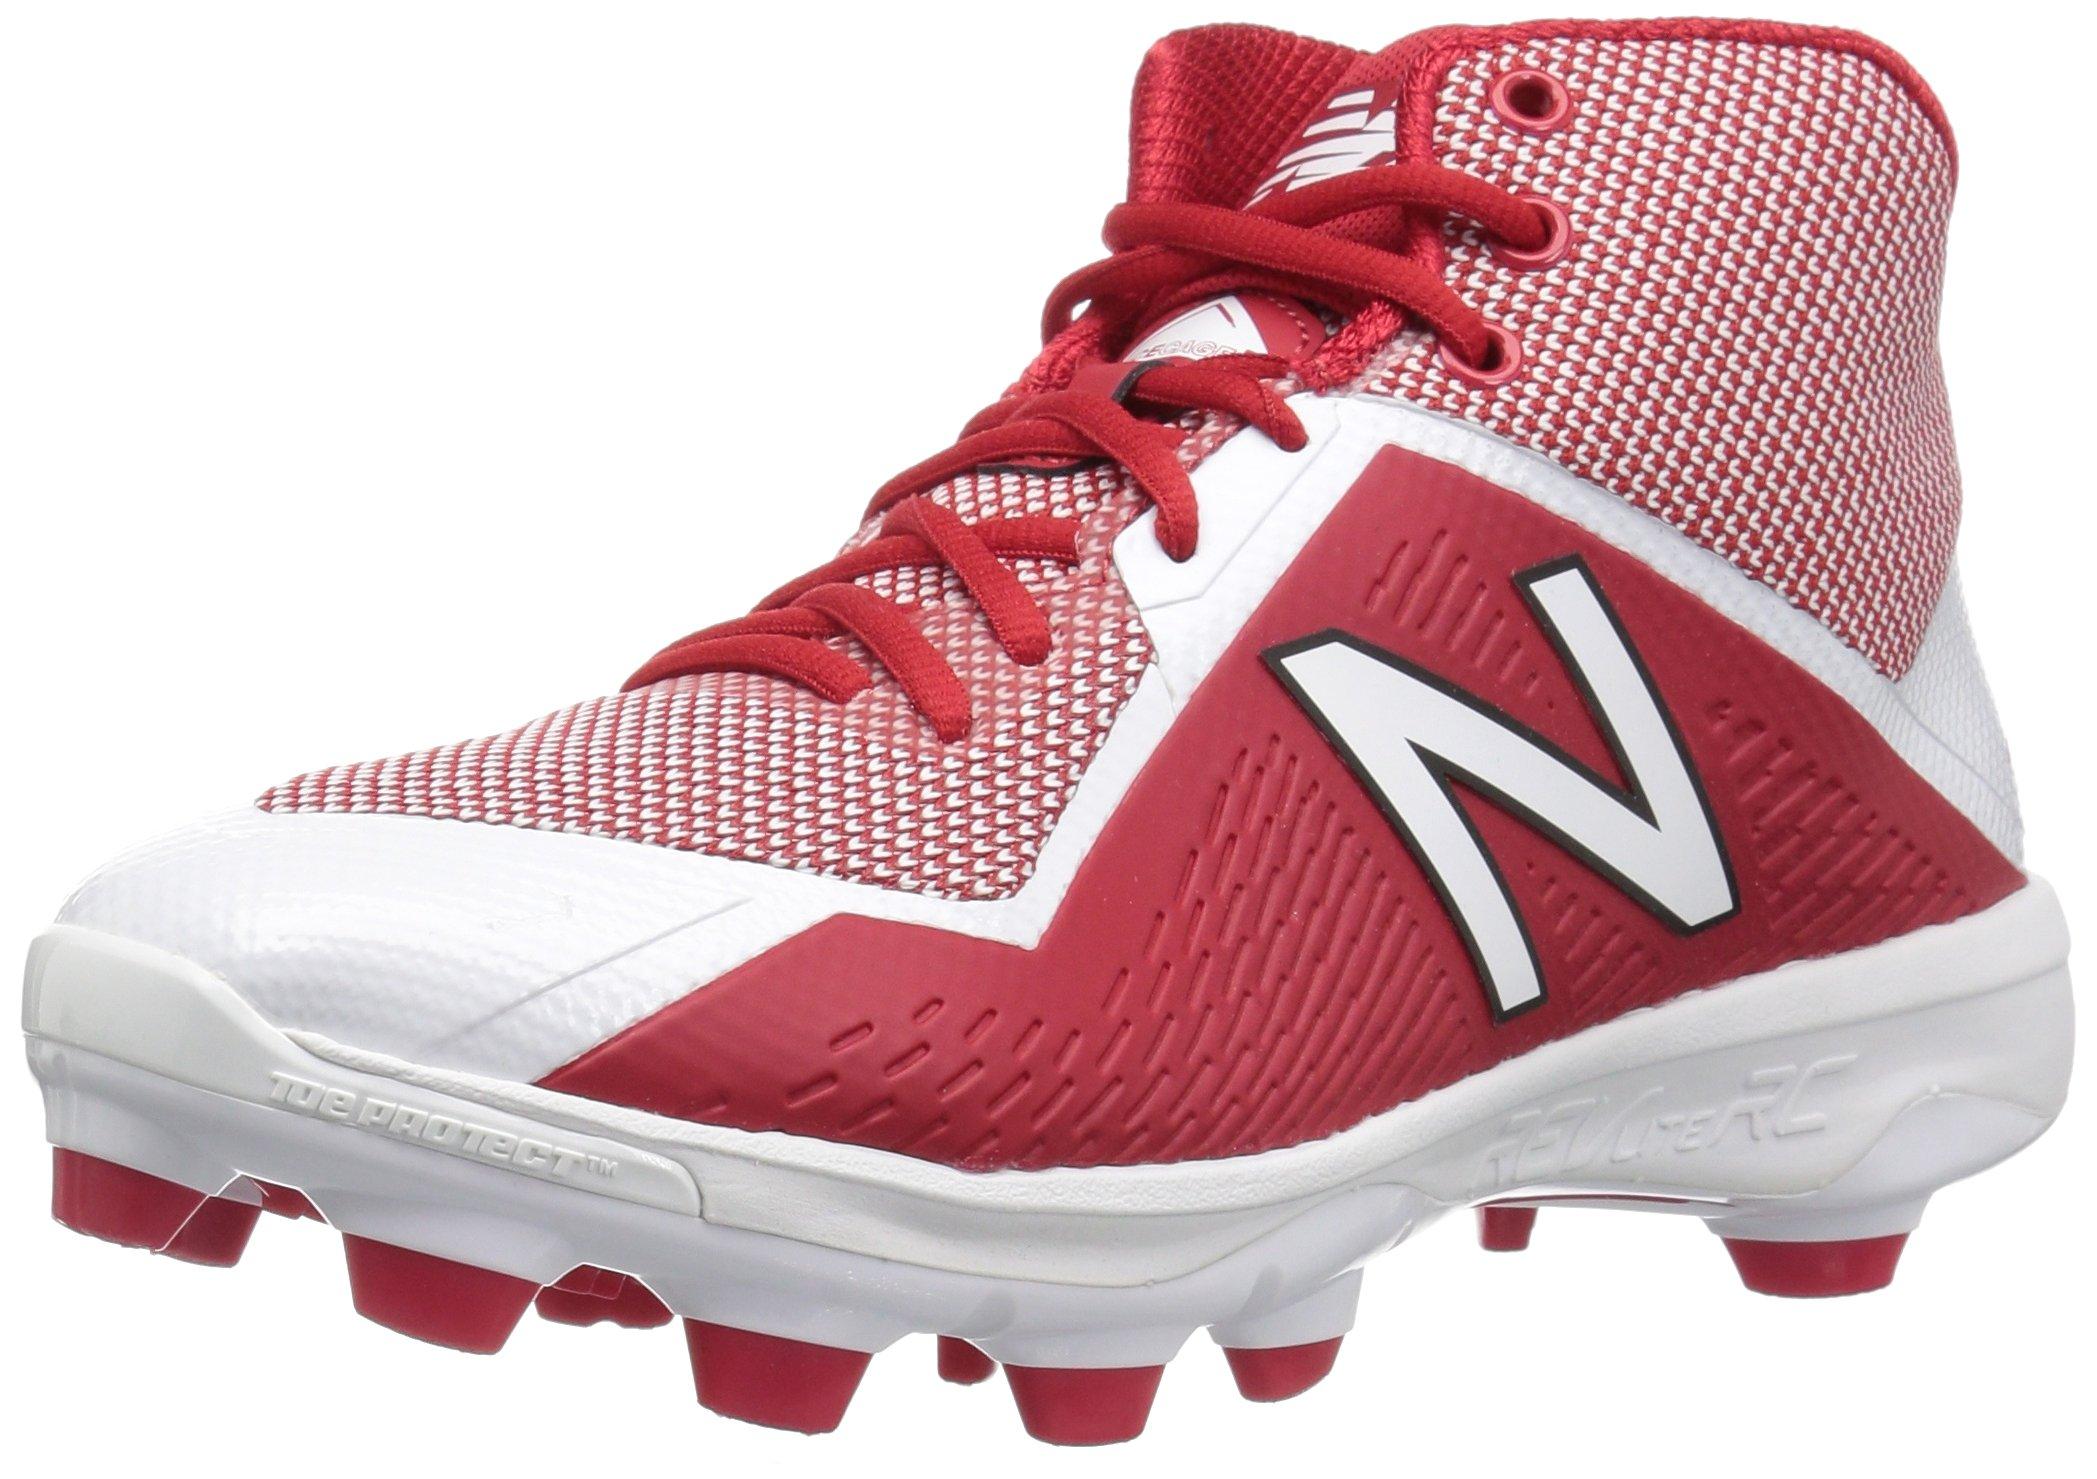 New Balance Men's PM4040v4 Molded Baseball Shoe, Red/White, 5.5 2E US by New Balance